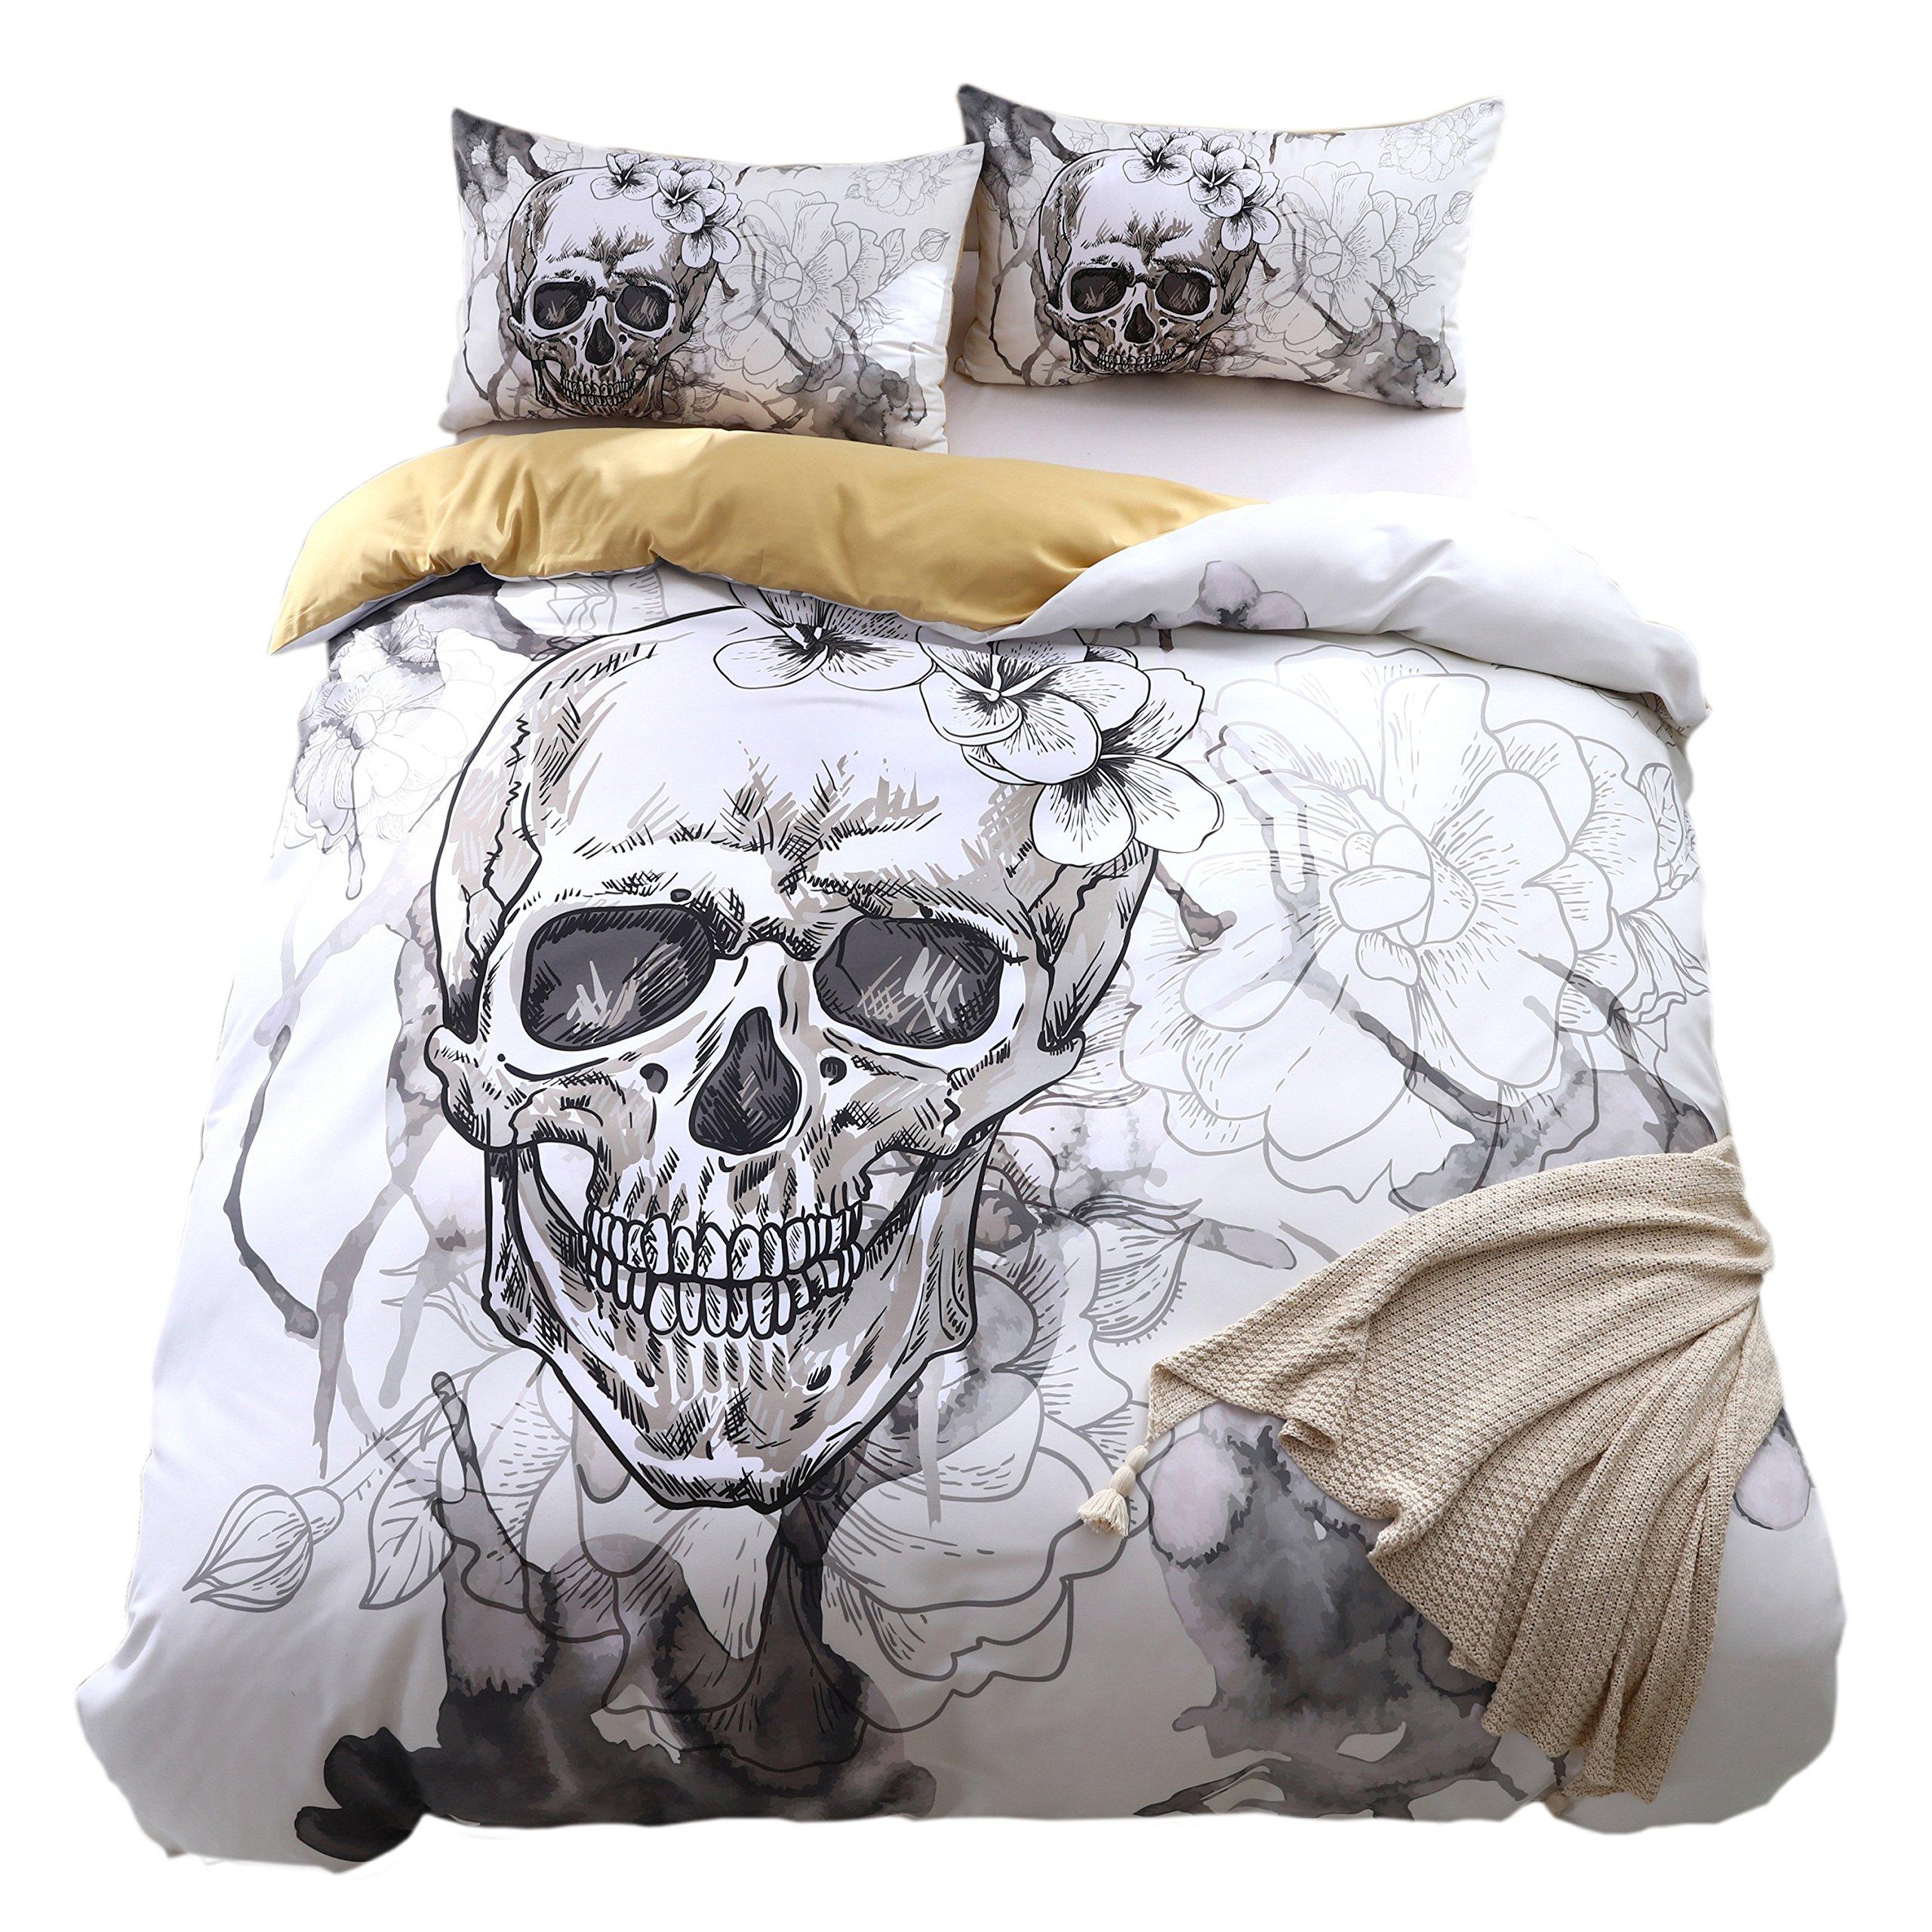 KTLRR Skull Bedding Set,Polyester Fully Modern Flower Skull Gray and Black Duvet Cover Set, Queen Size Decorative 3 Pieces Bedding with 2 Pillow Shams,No Comforter (Skull B, Queen 3pcs)